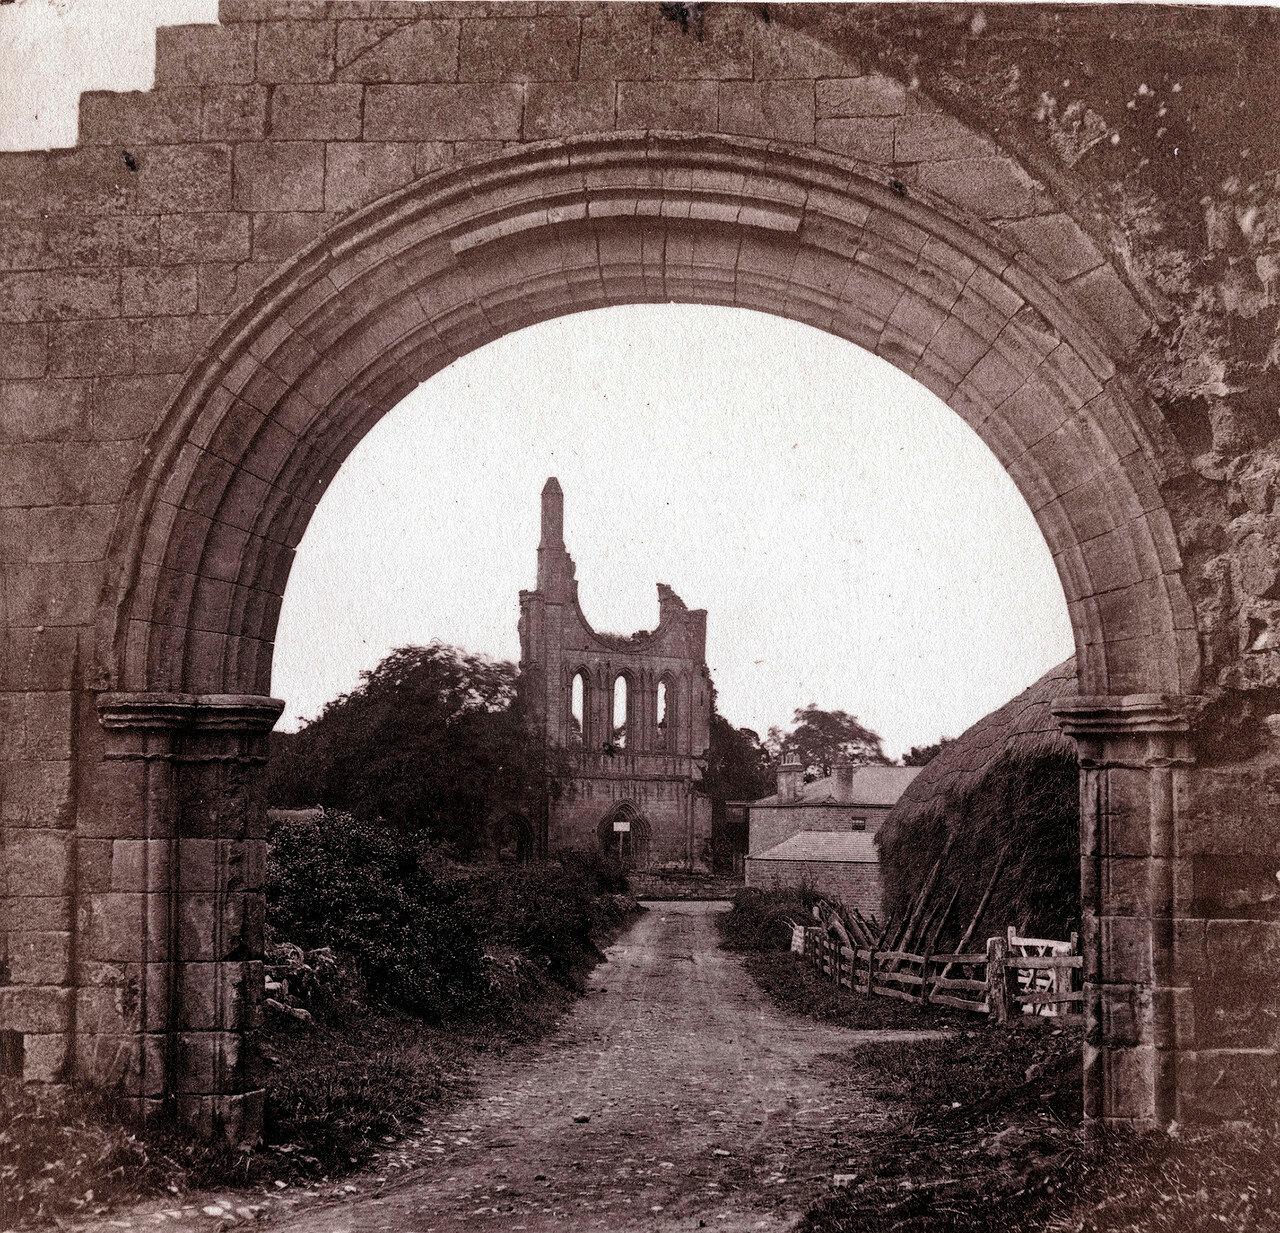 Аббатство Байланд. Великобритания, 1864